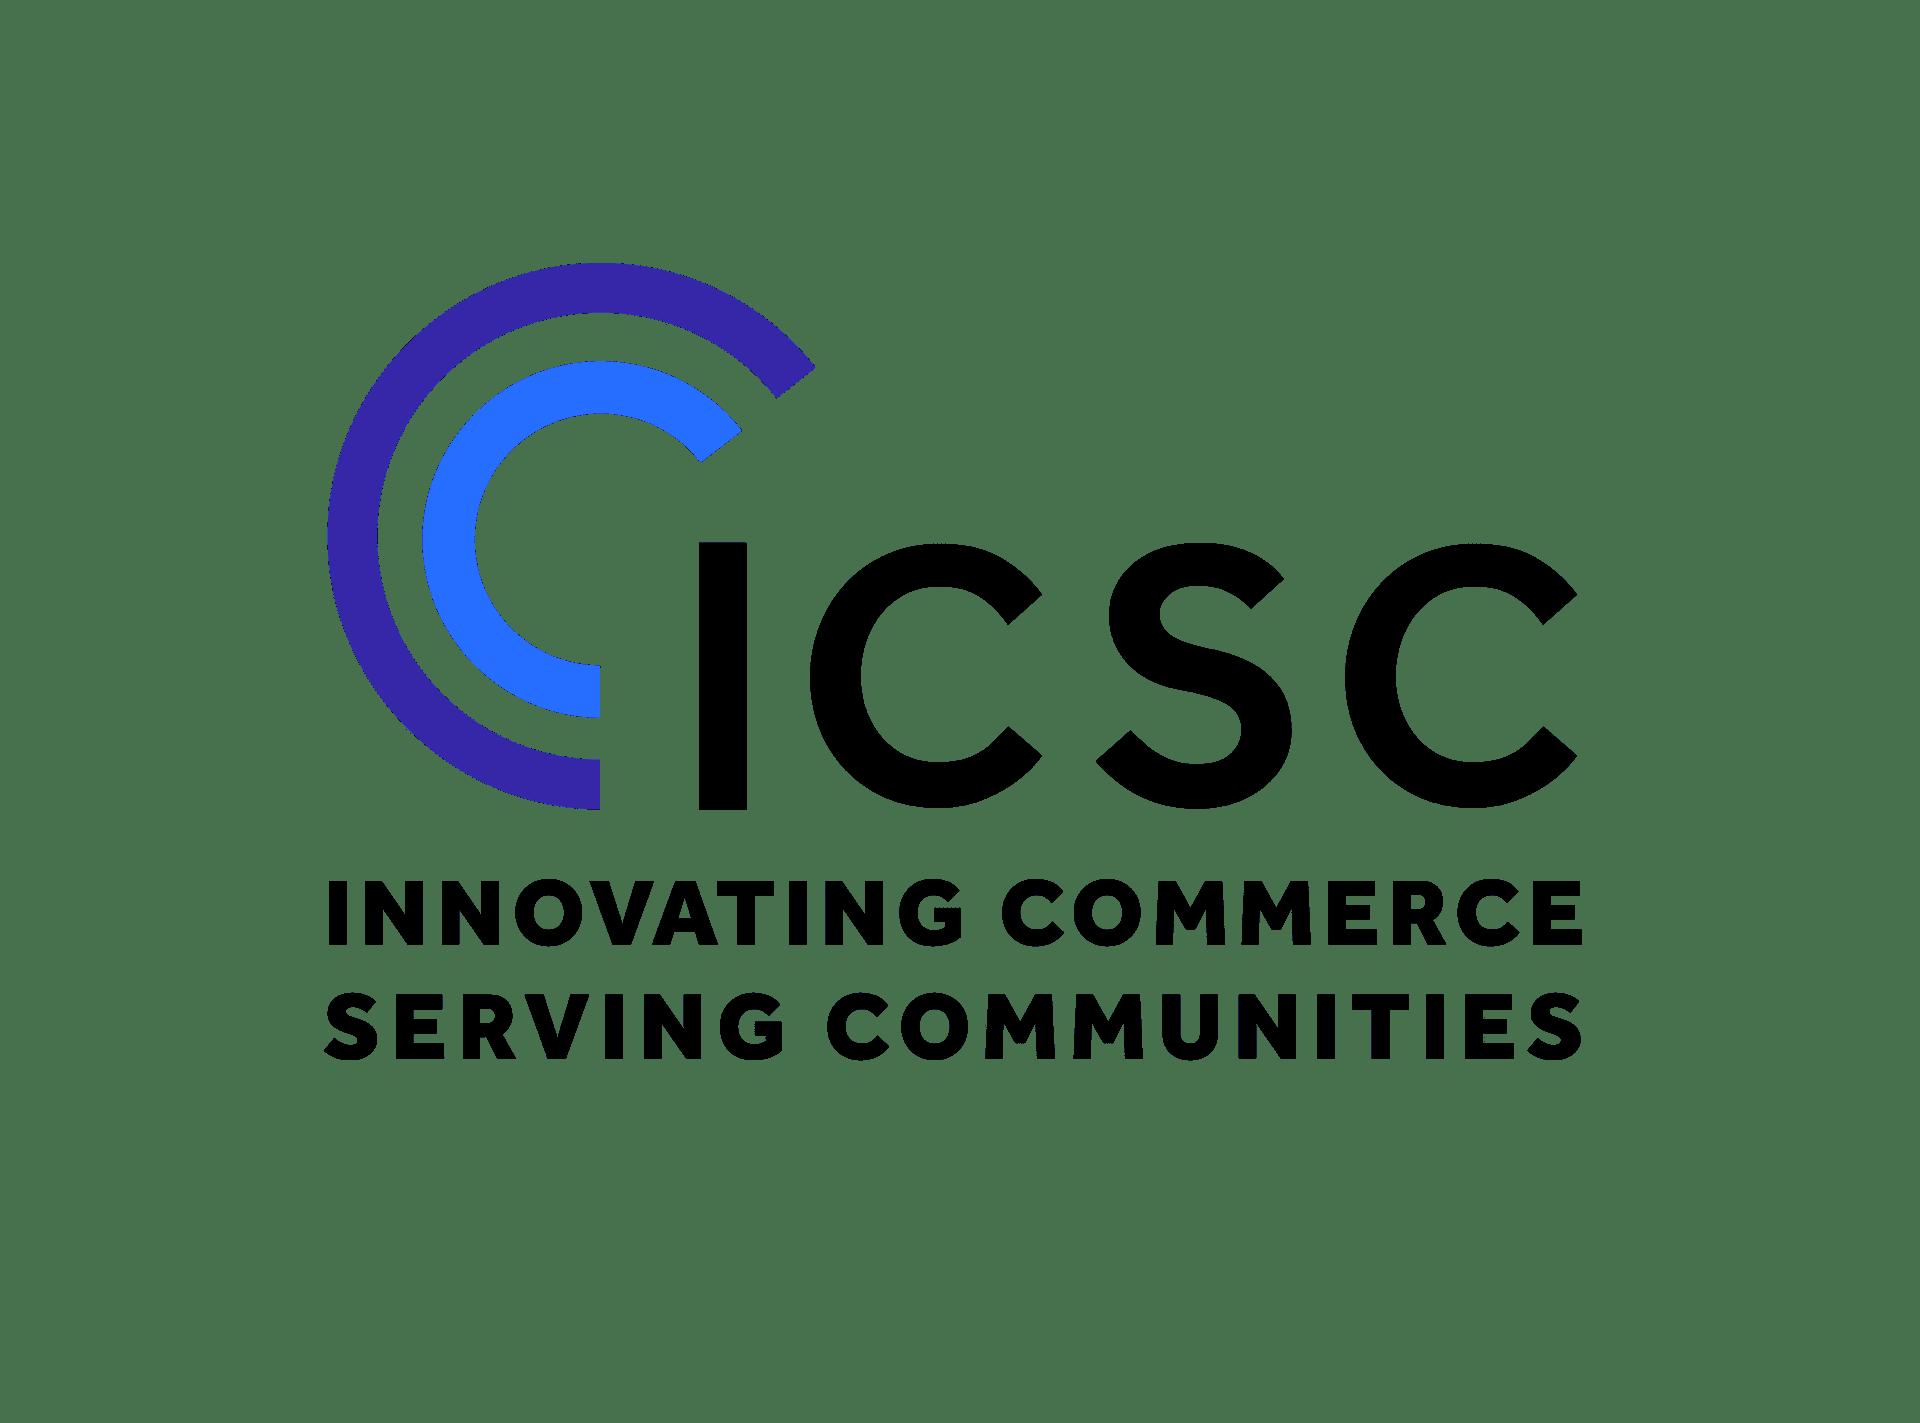 Accruent - Resources - Event - ICSC - Here We Go  - Logo